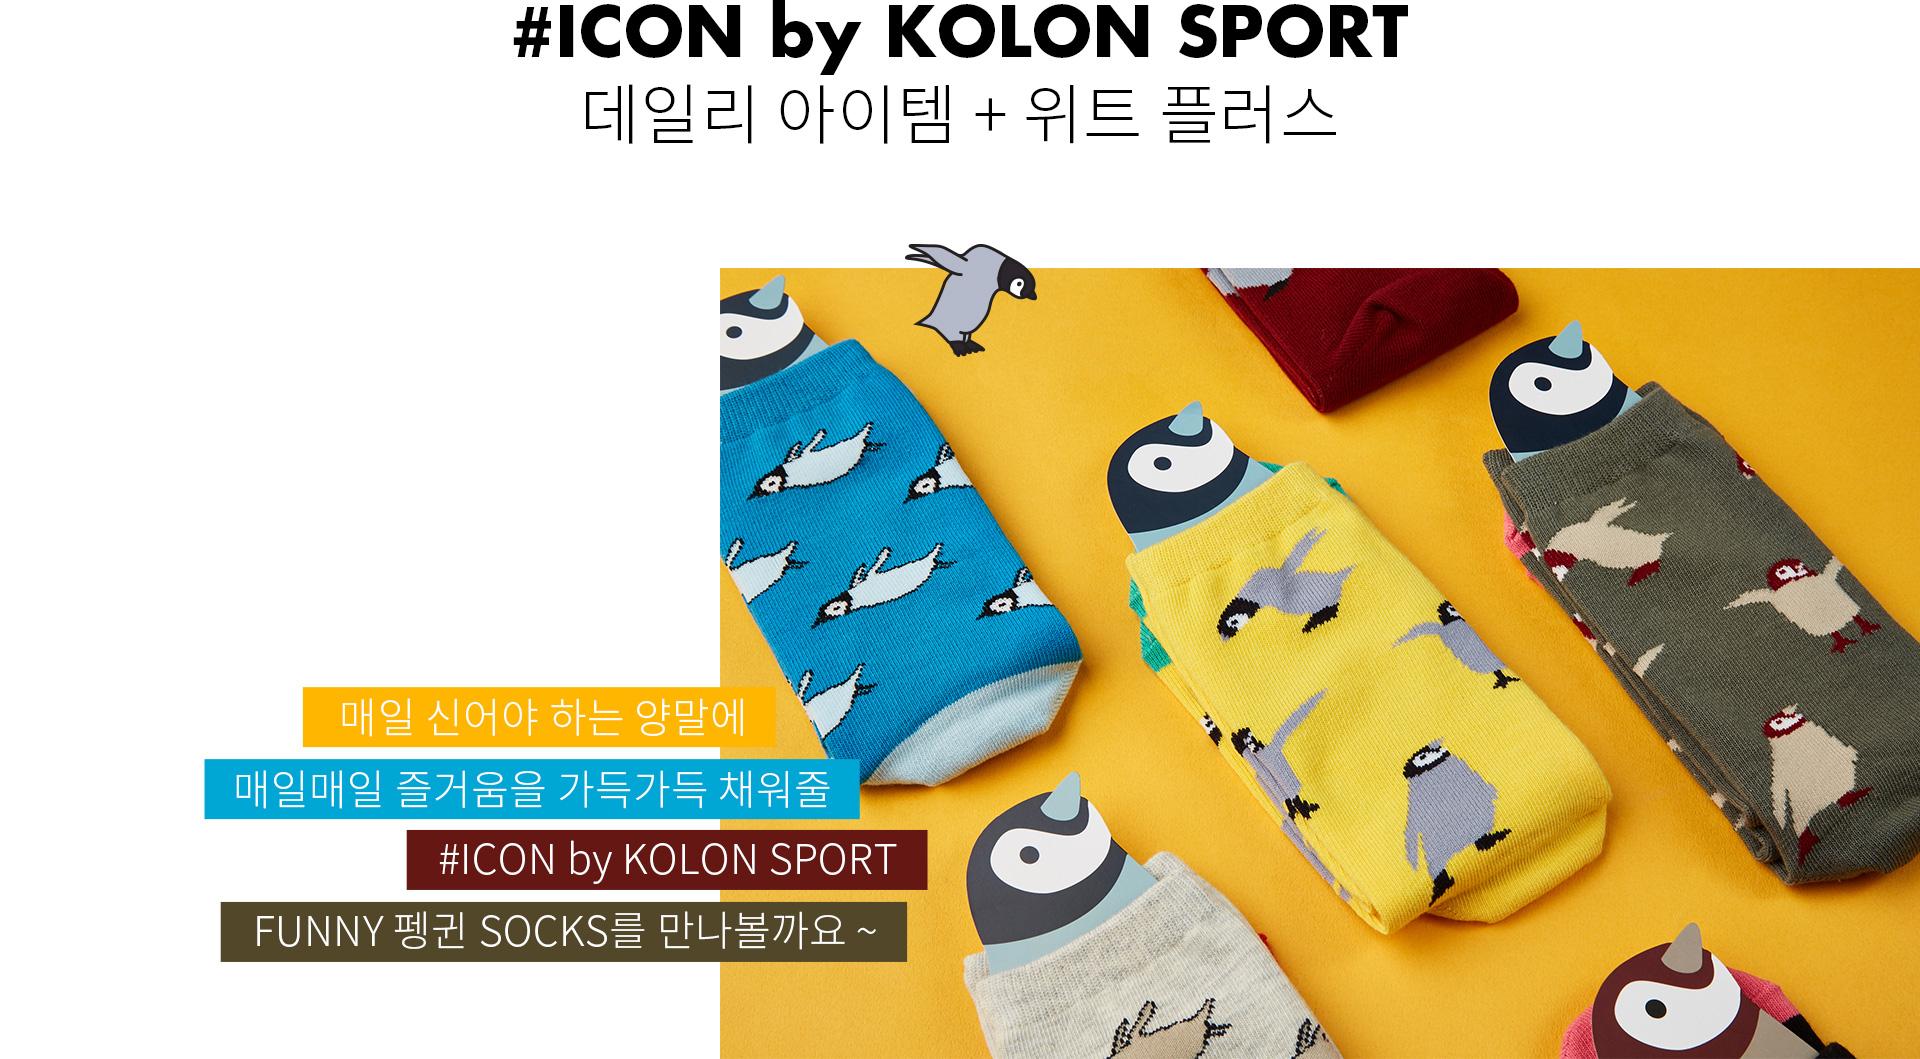 #ICON by KOLON SPORT 데일리 아이템 + 위트 플러스 매일 신어야 하는 양말에 매일매일 즐거움을 가득가득 채워줄 #ICON by KOLON SPORT FUNNY 펭귄 SOCKS를 만나볼까요~